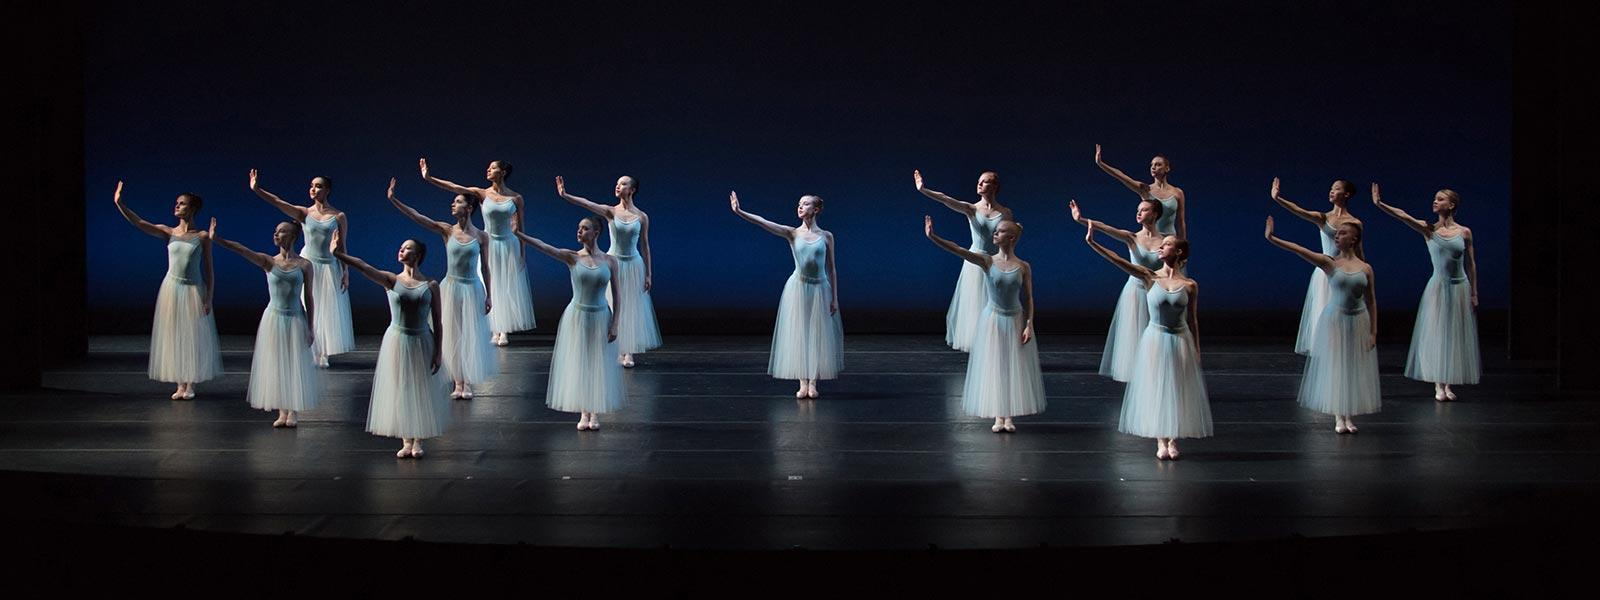 """Serenade"" Choreography by George Balanchine © The George Balanchine Trust / Photo: Peter J. Mueller"